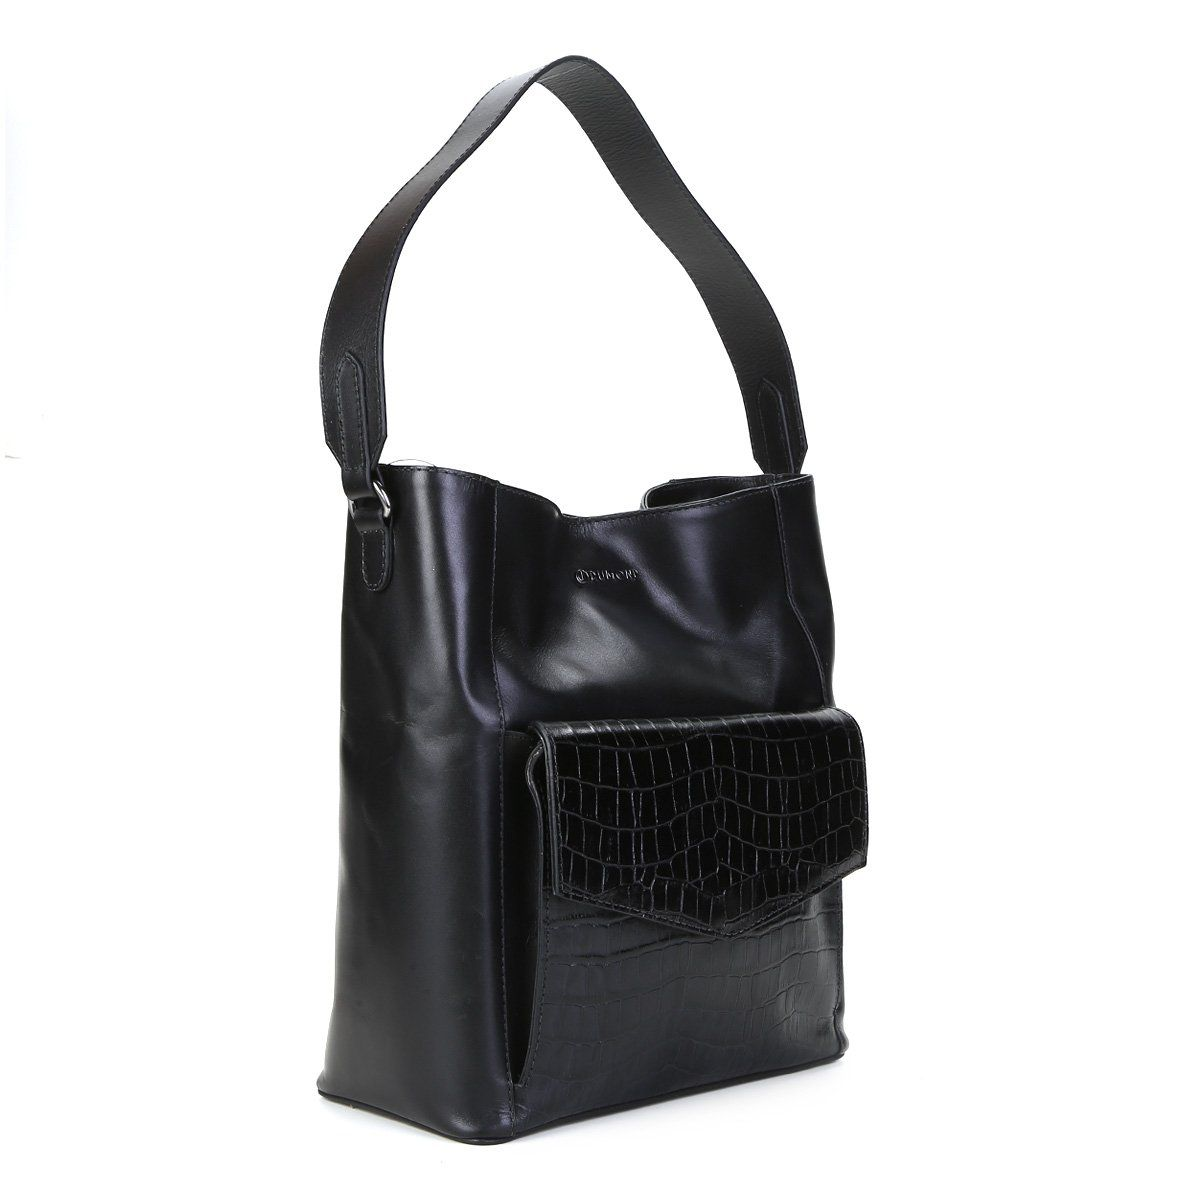 Bolsa Dumond Shopper Couro Feminina